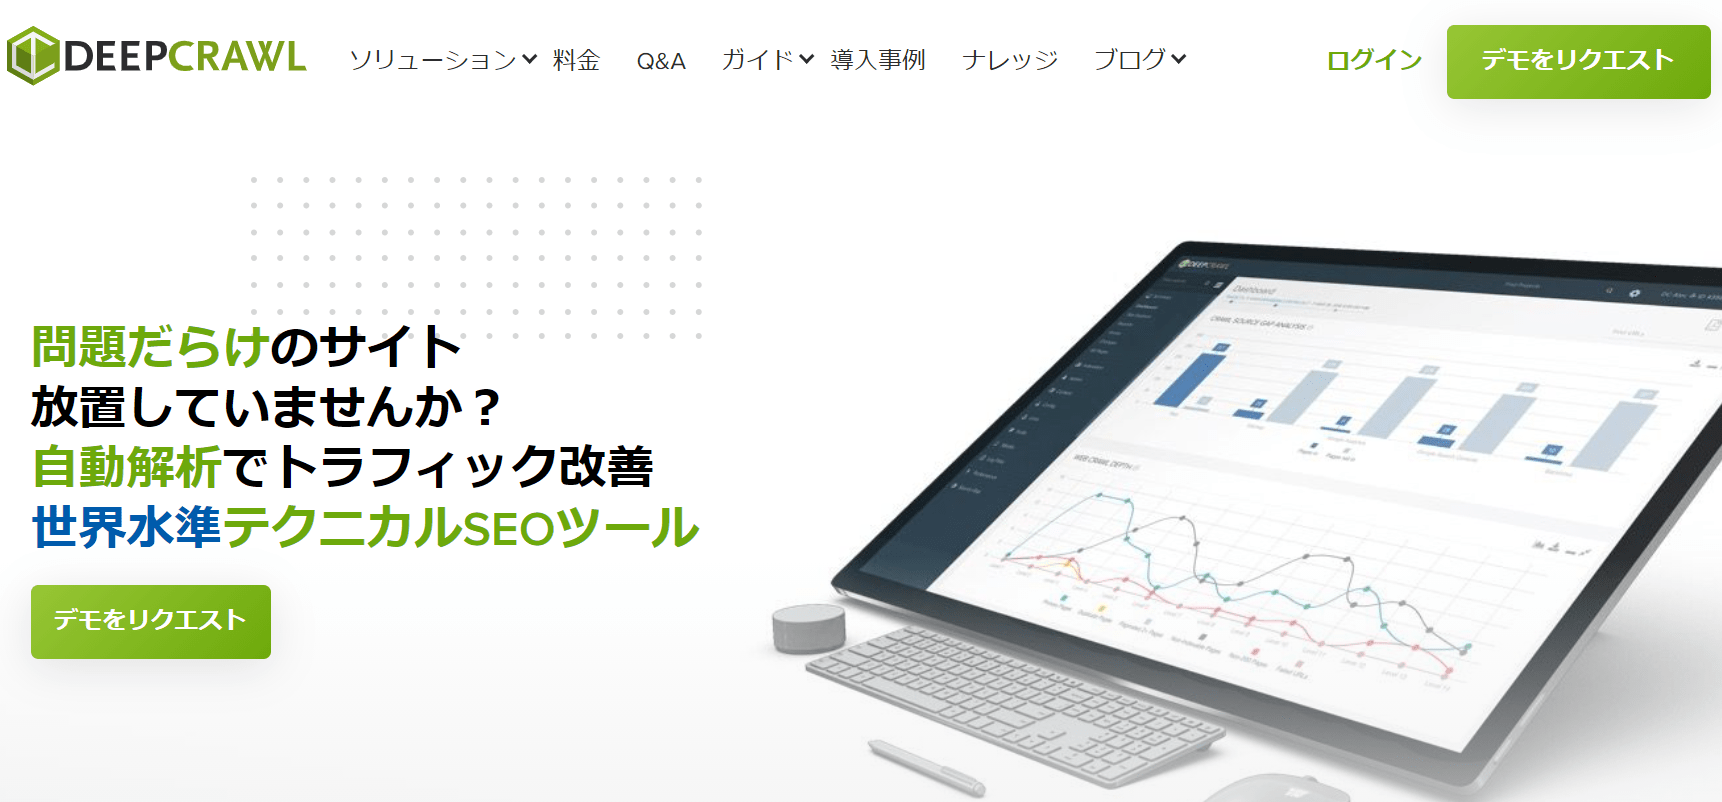 deepcrawl-SEO内部ツール